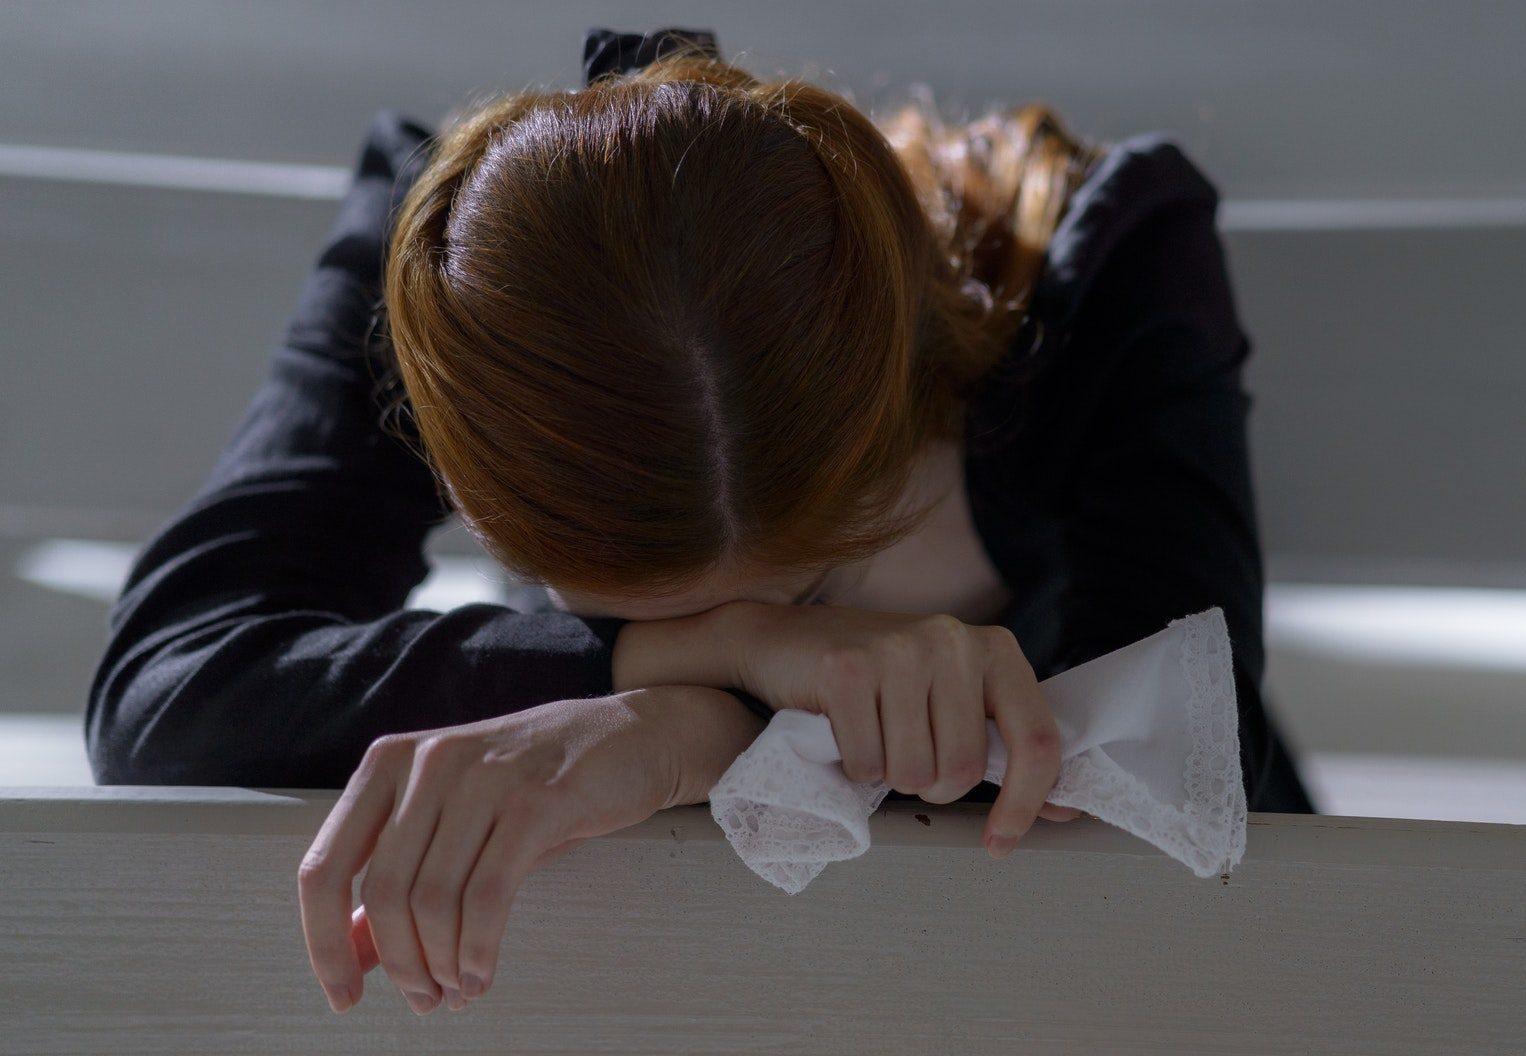 Emotional Regulation. Female crying and overwhelmed